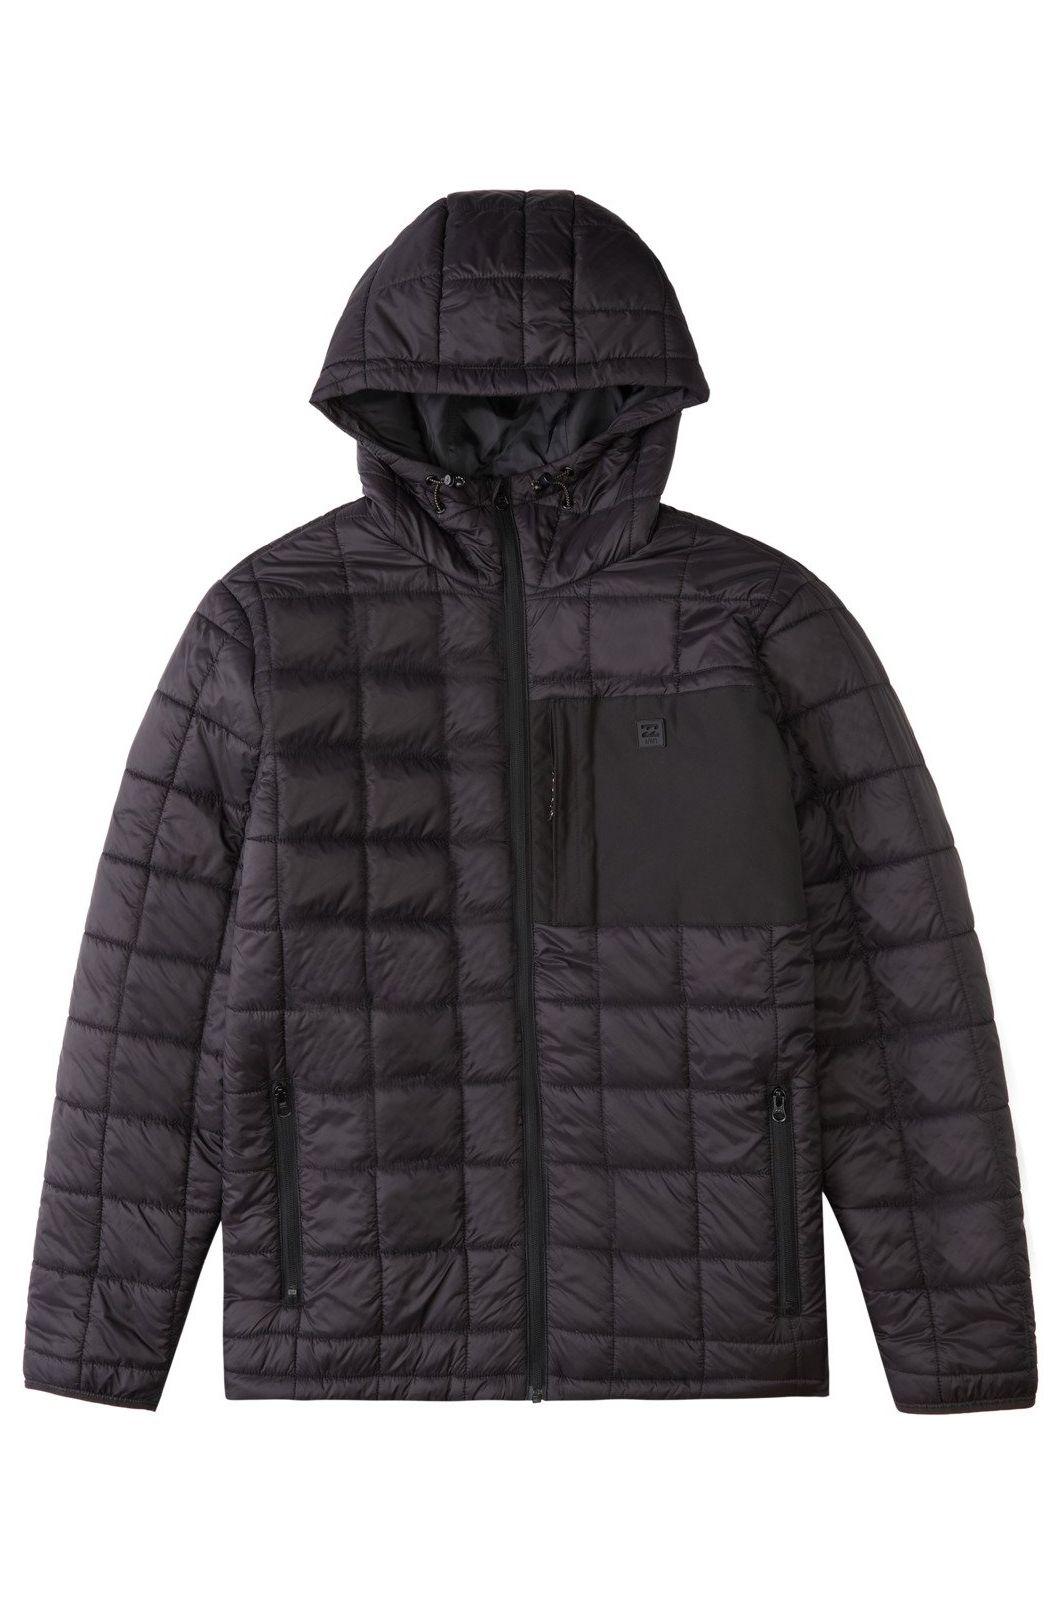 Billabong Jacket JOURNEY PUFFER JACKE ADVENTURE DIVISION Black